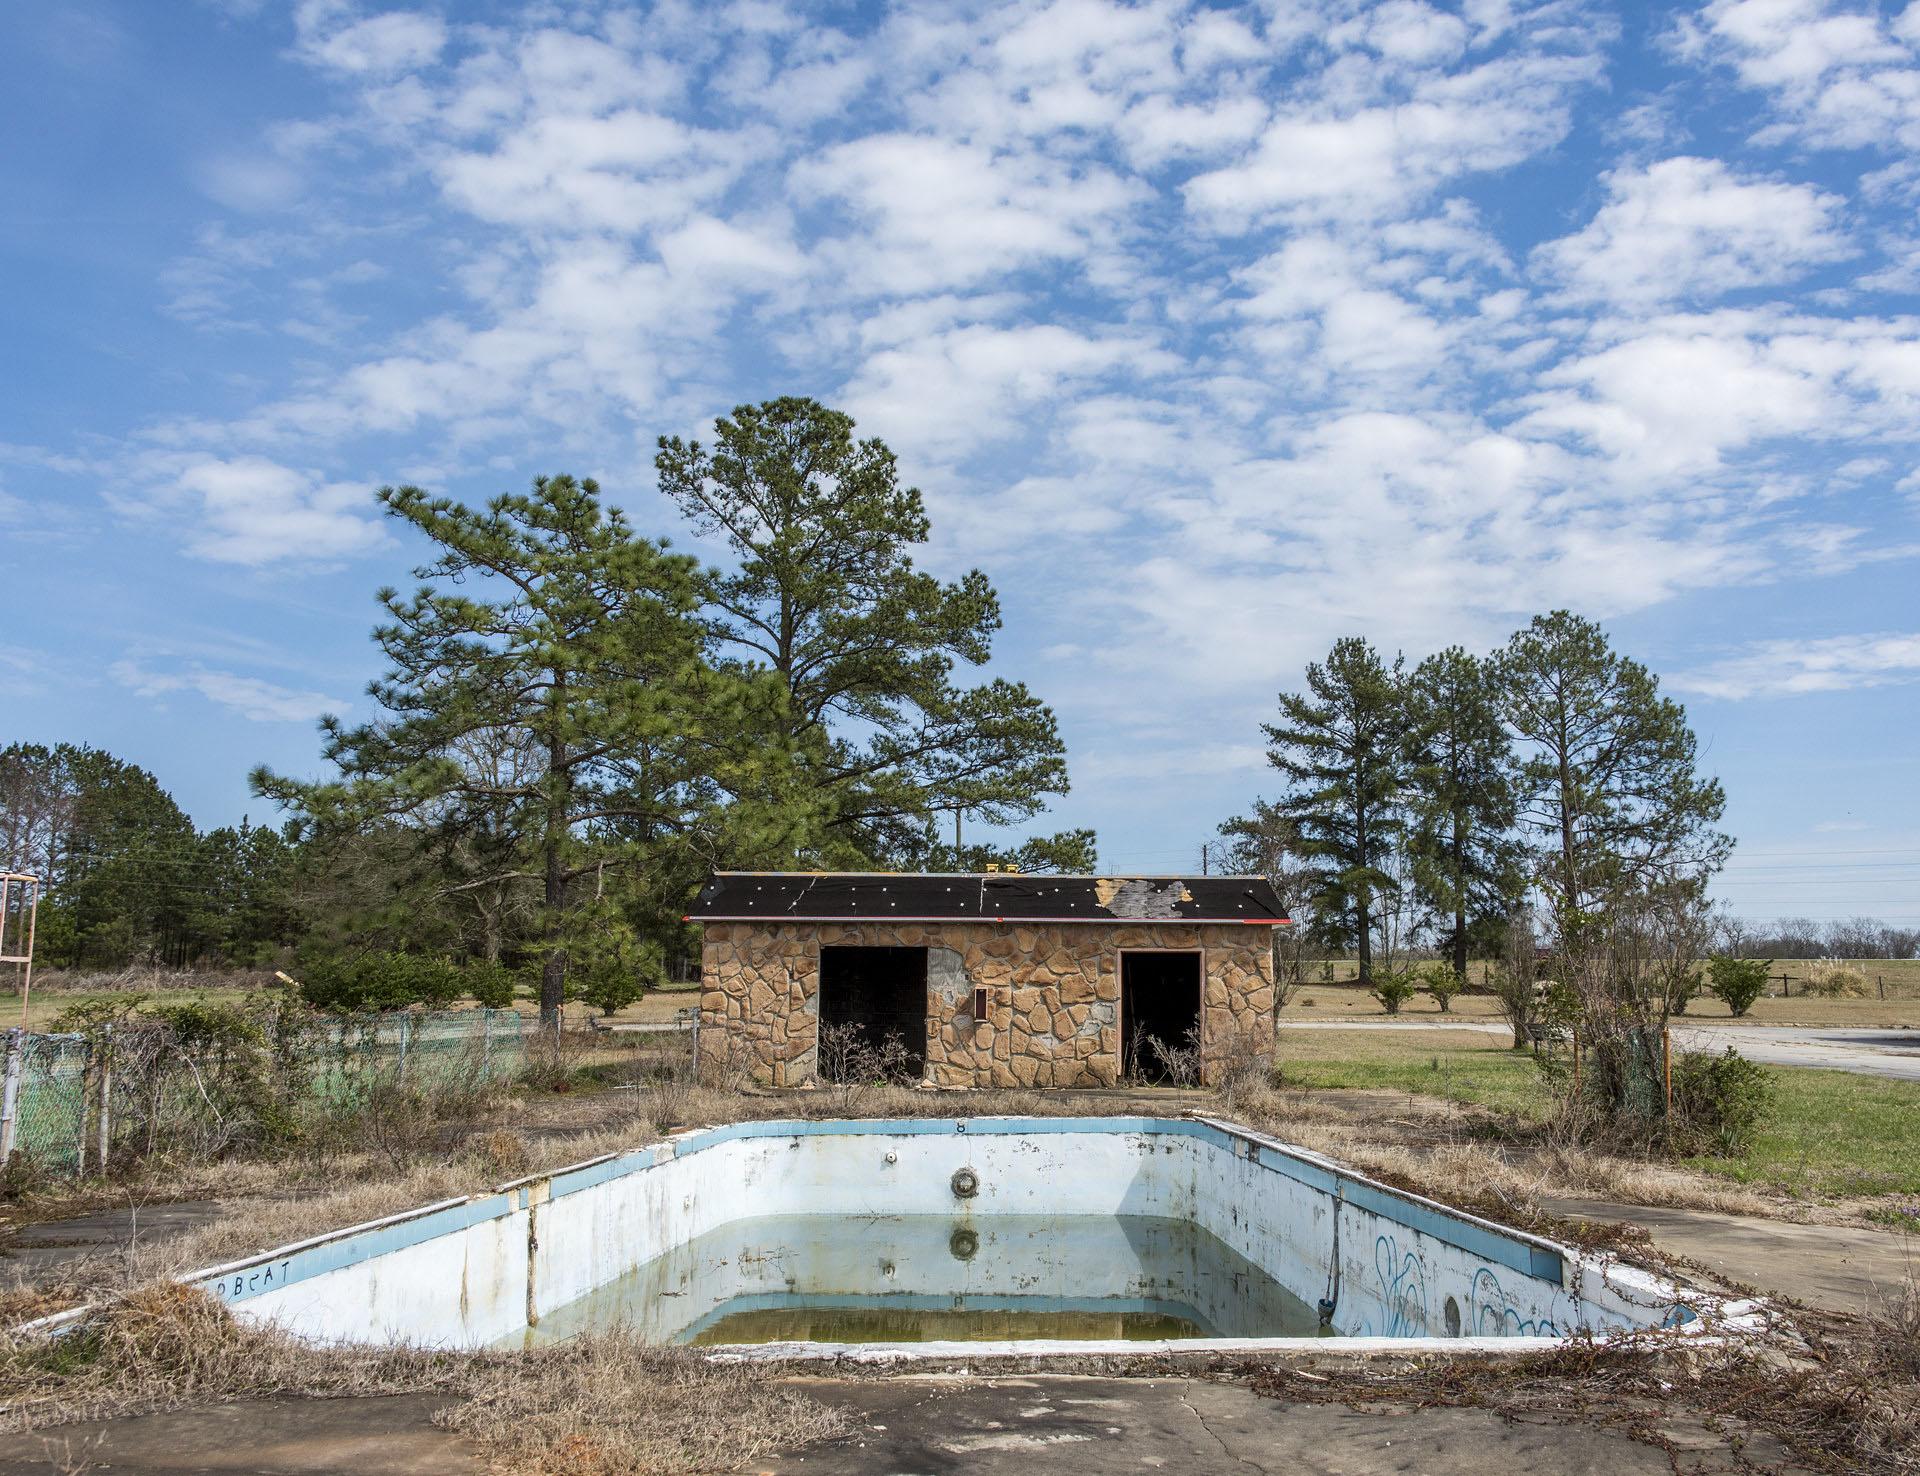 Knights Inn Pool  Rowland, North Carolina